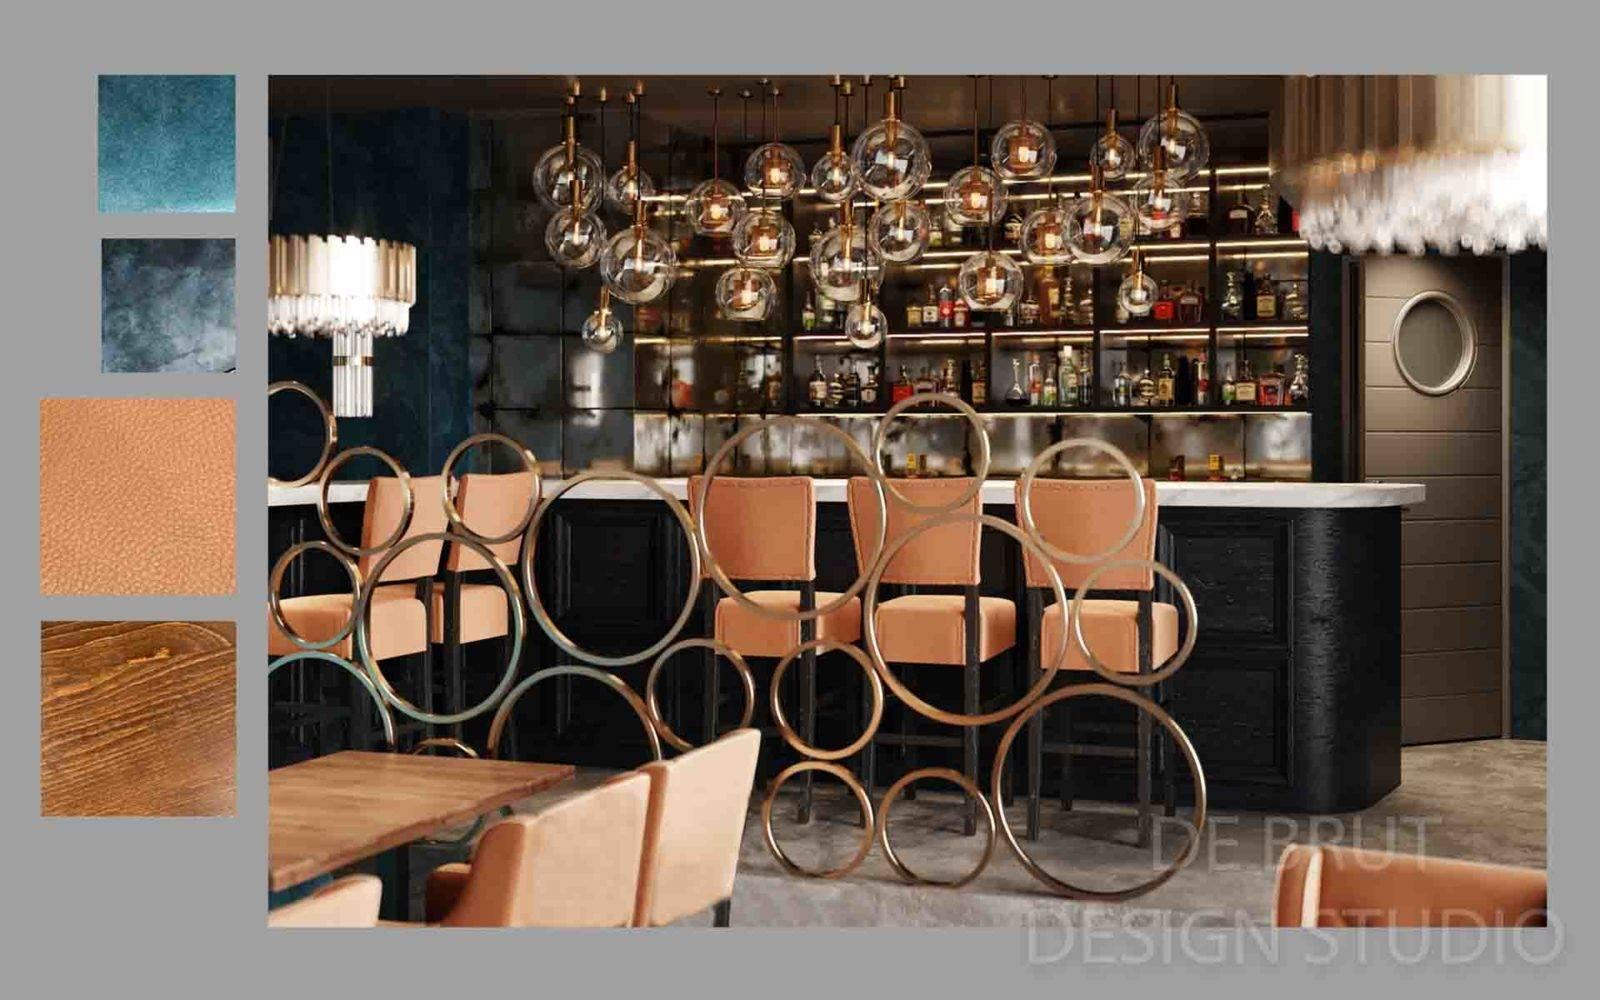 design interieru praha alex brut studio richman bussines bar 4 1 - Design interiéru restaurace Richman